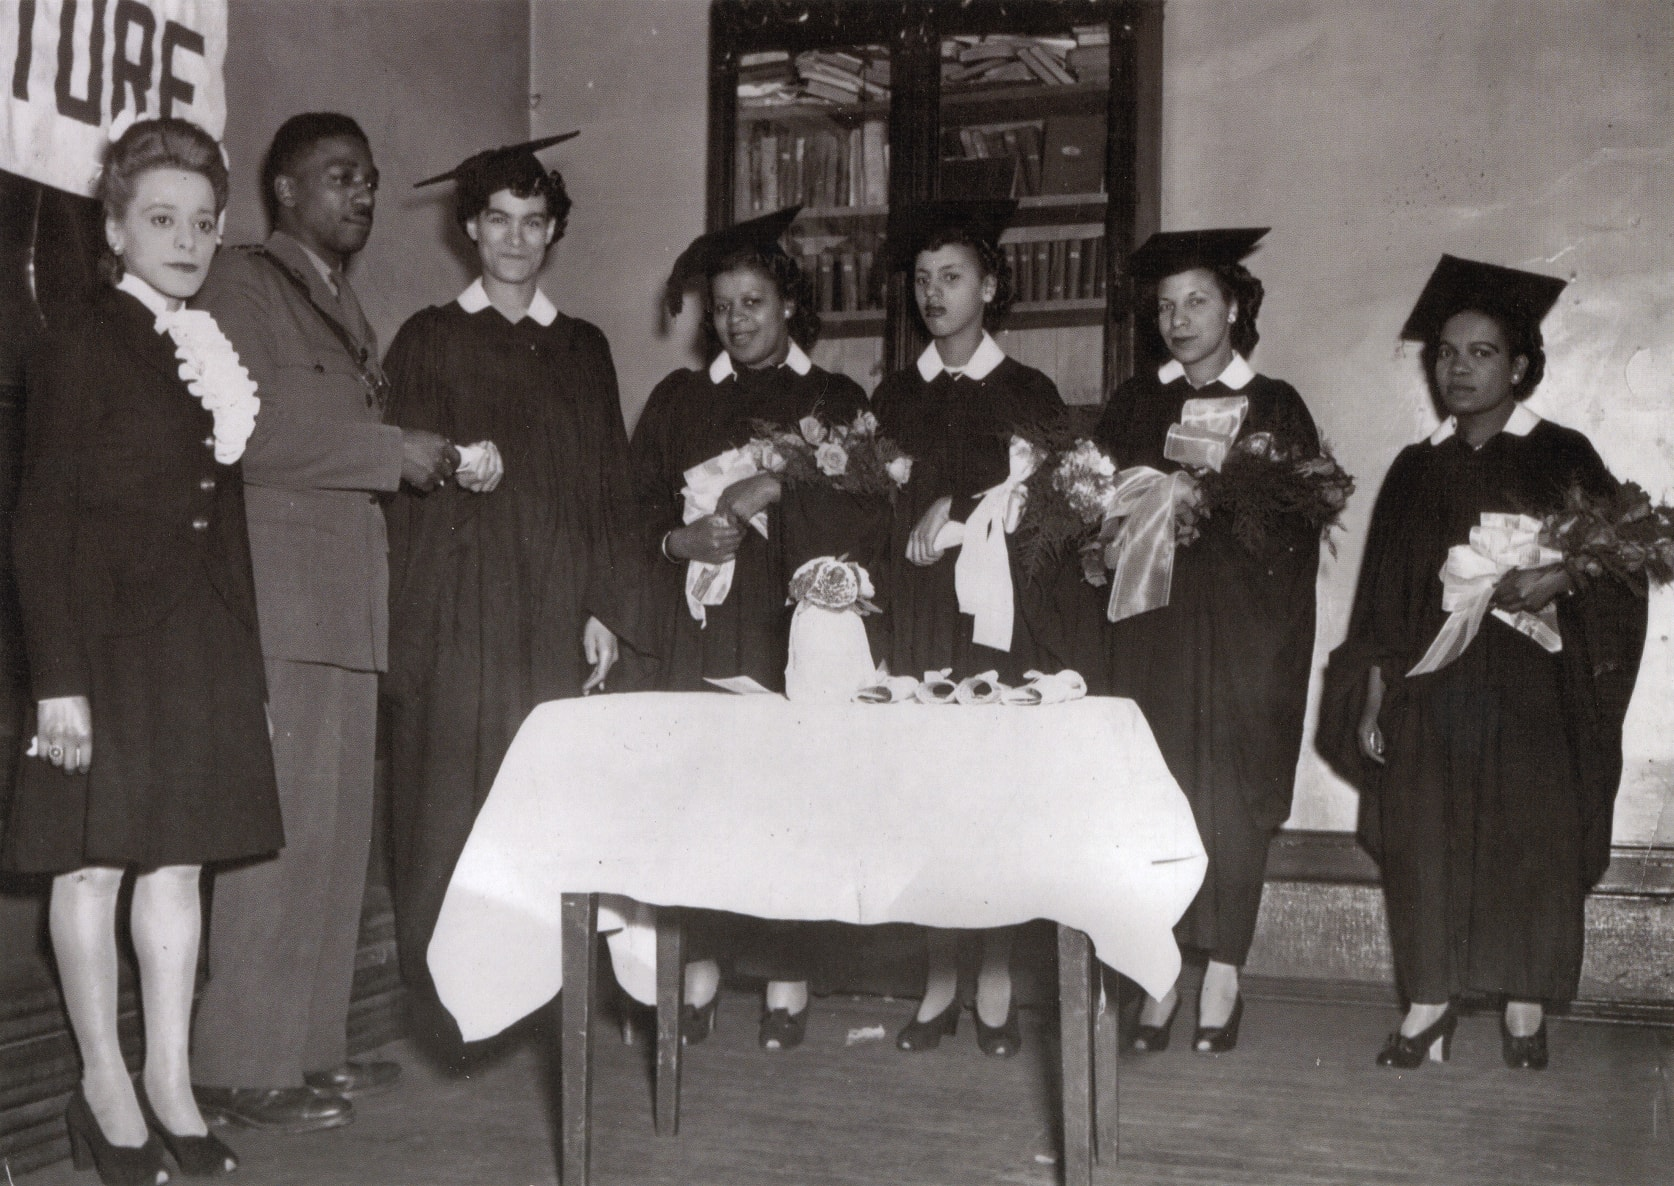 Viola Desmond with Graduates